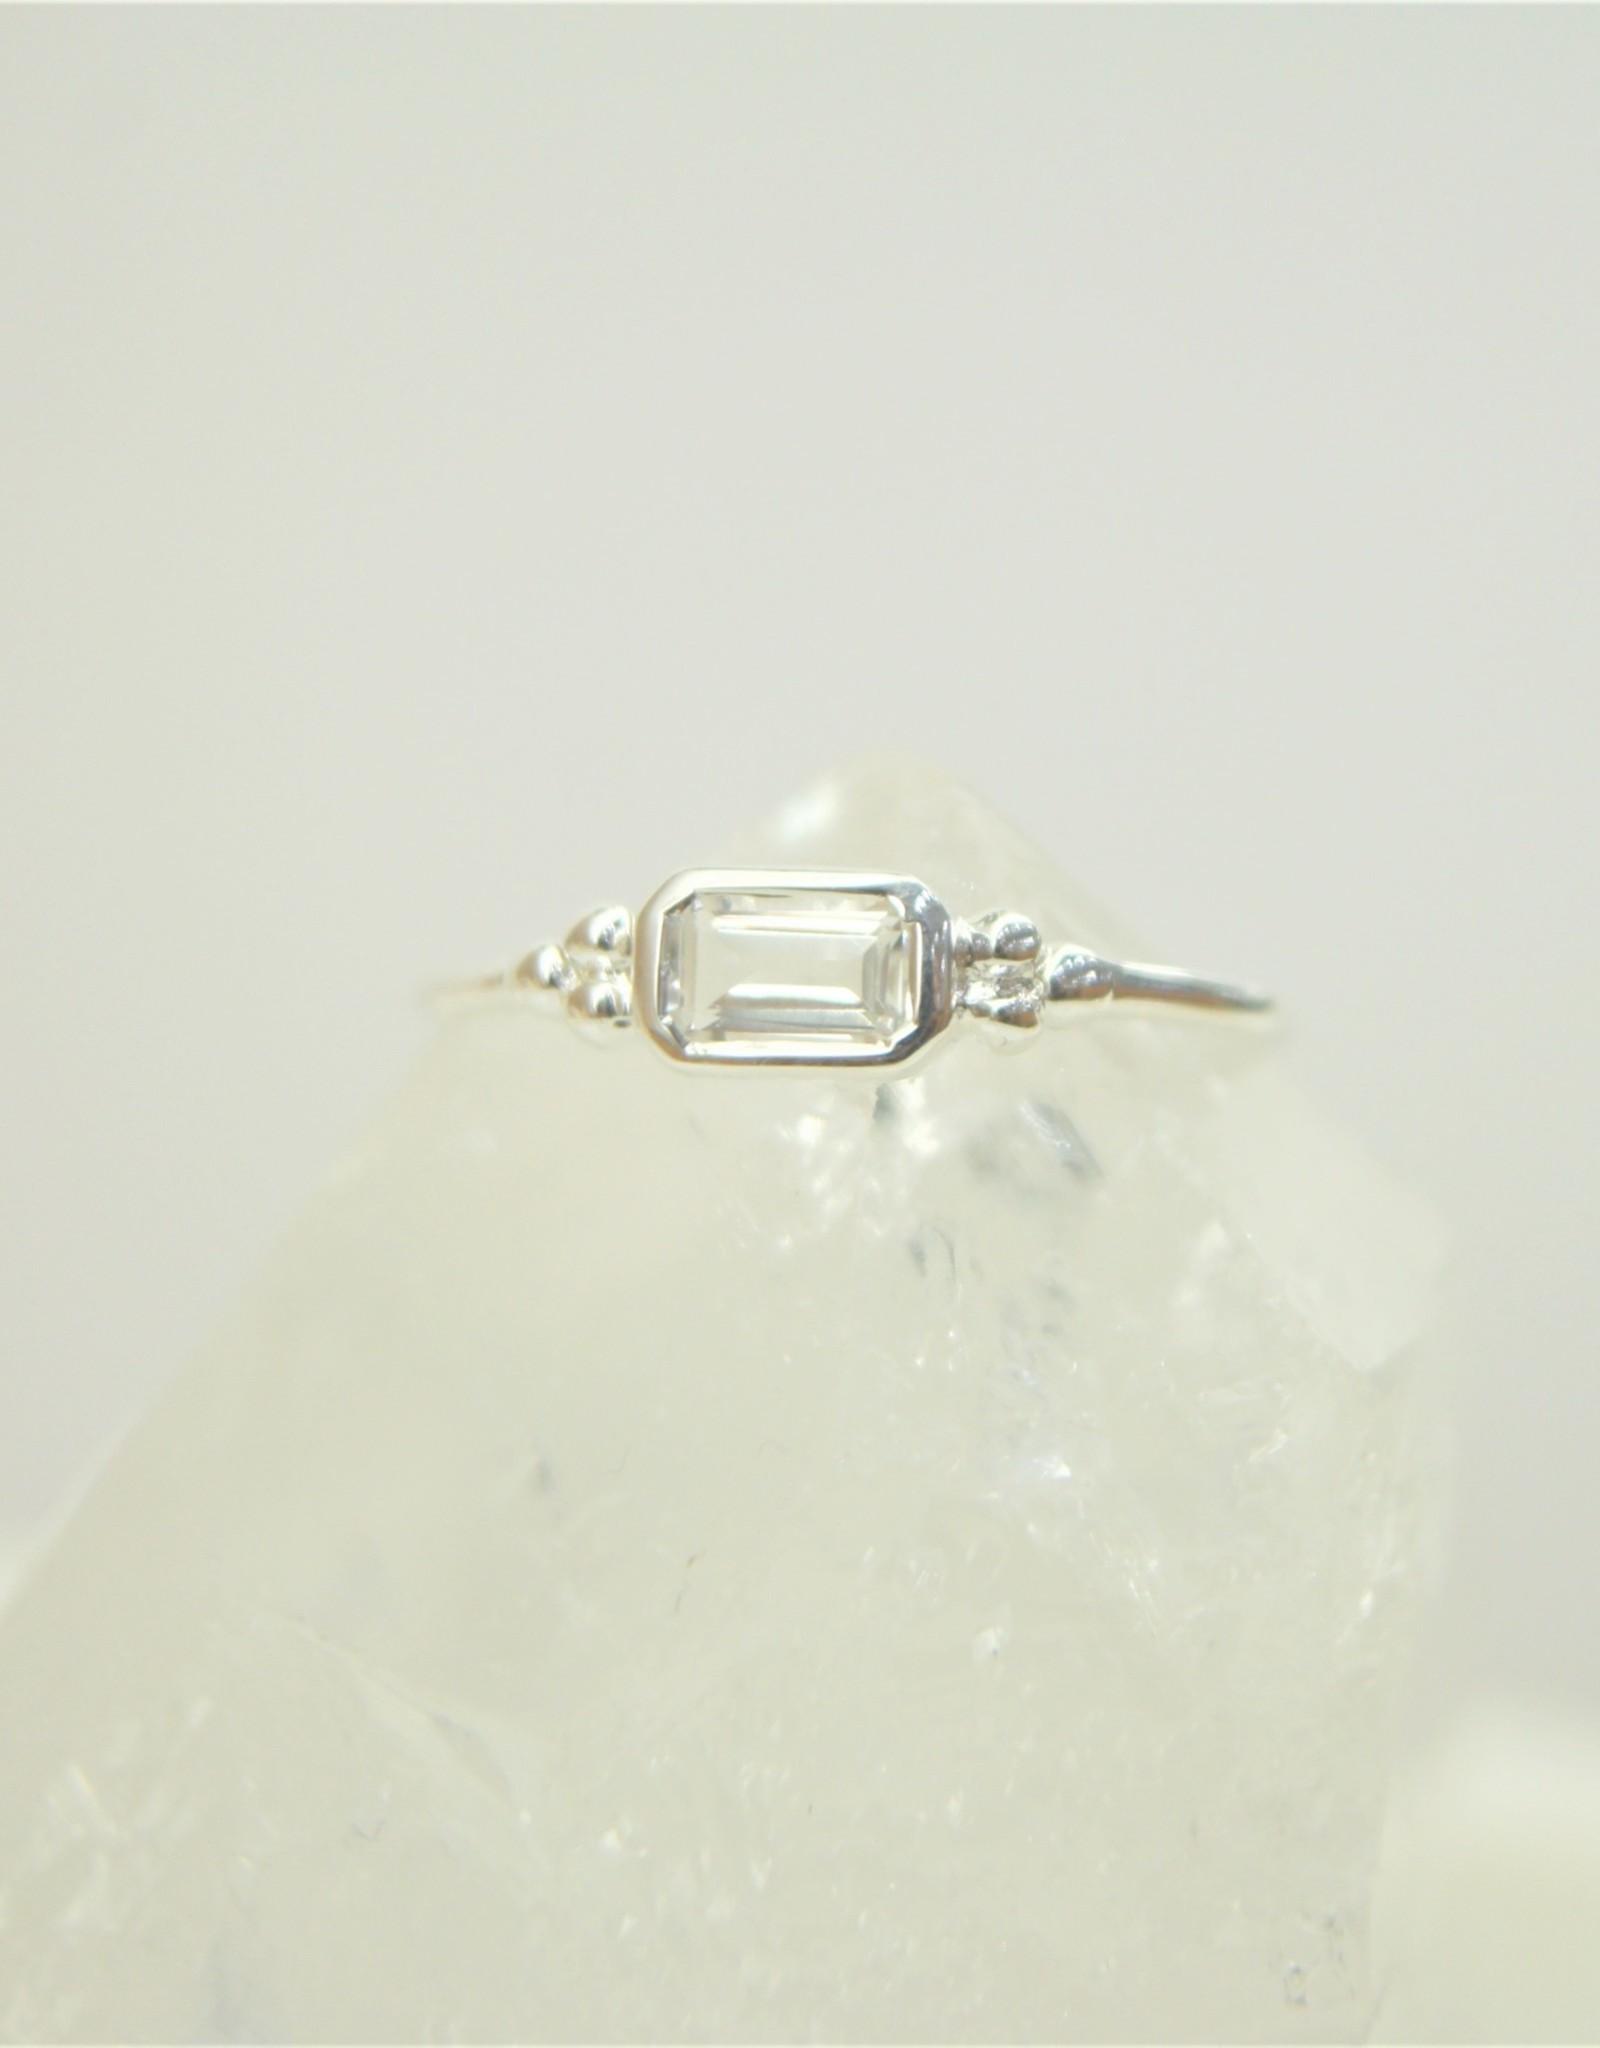 Tashi Emerald-Cut White Topaz Ring